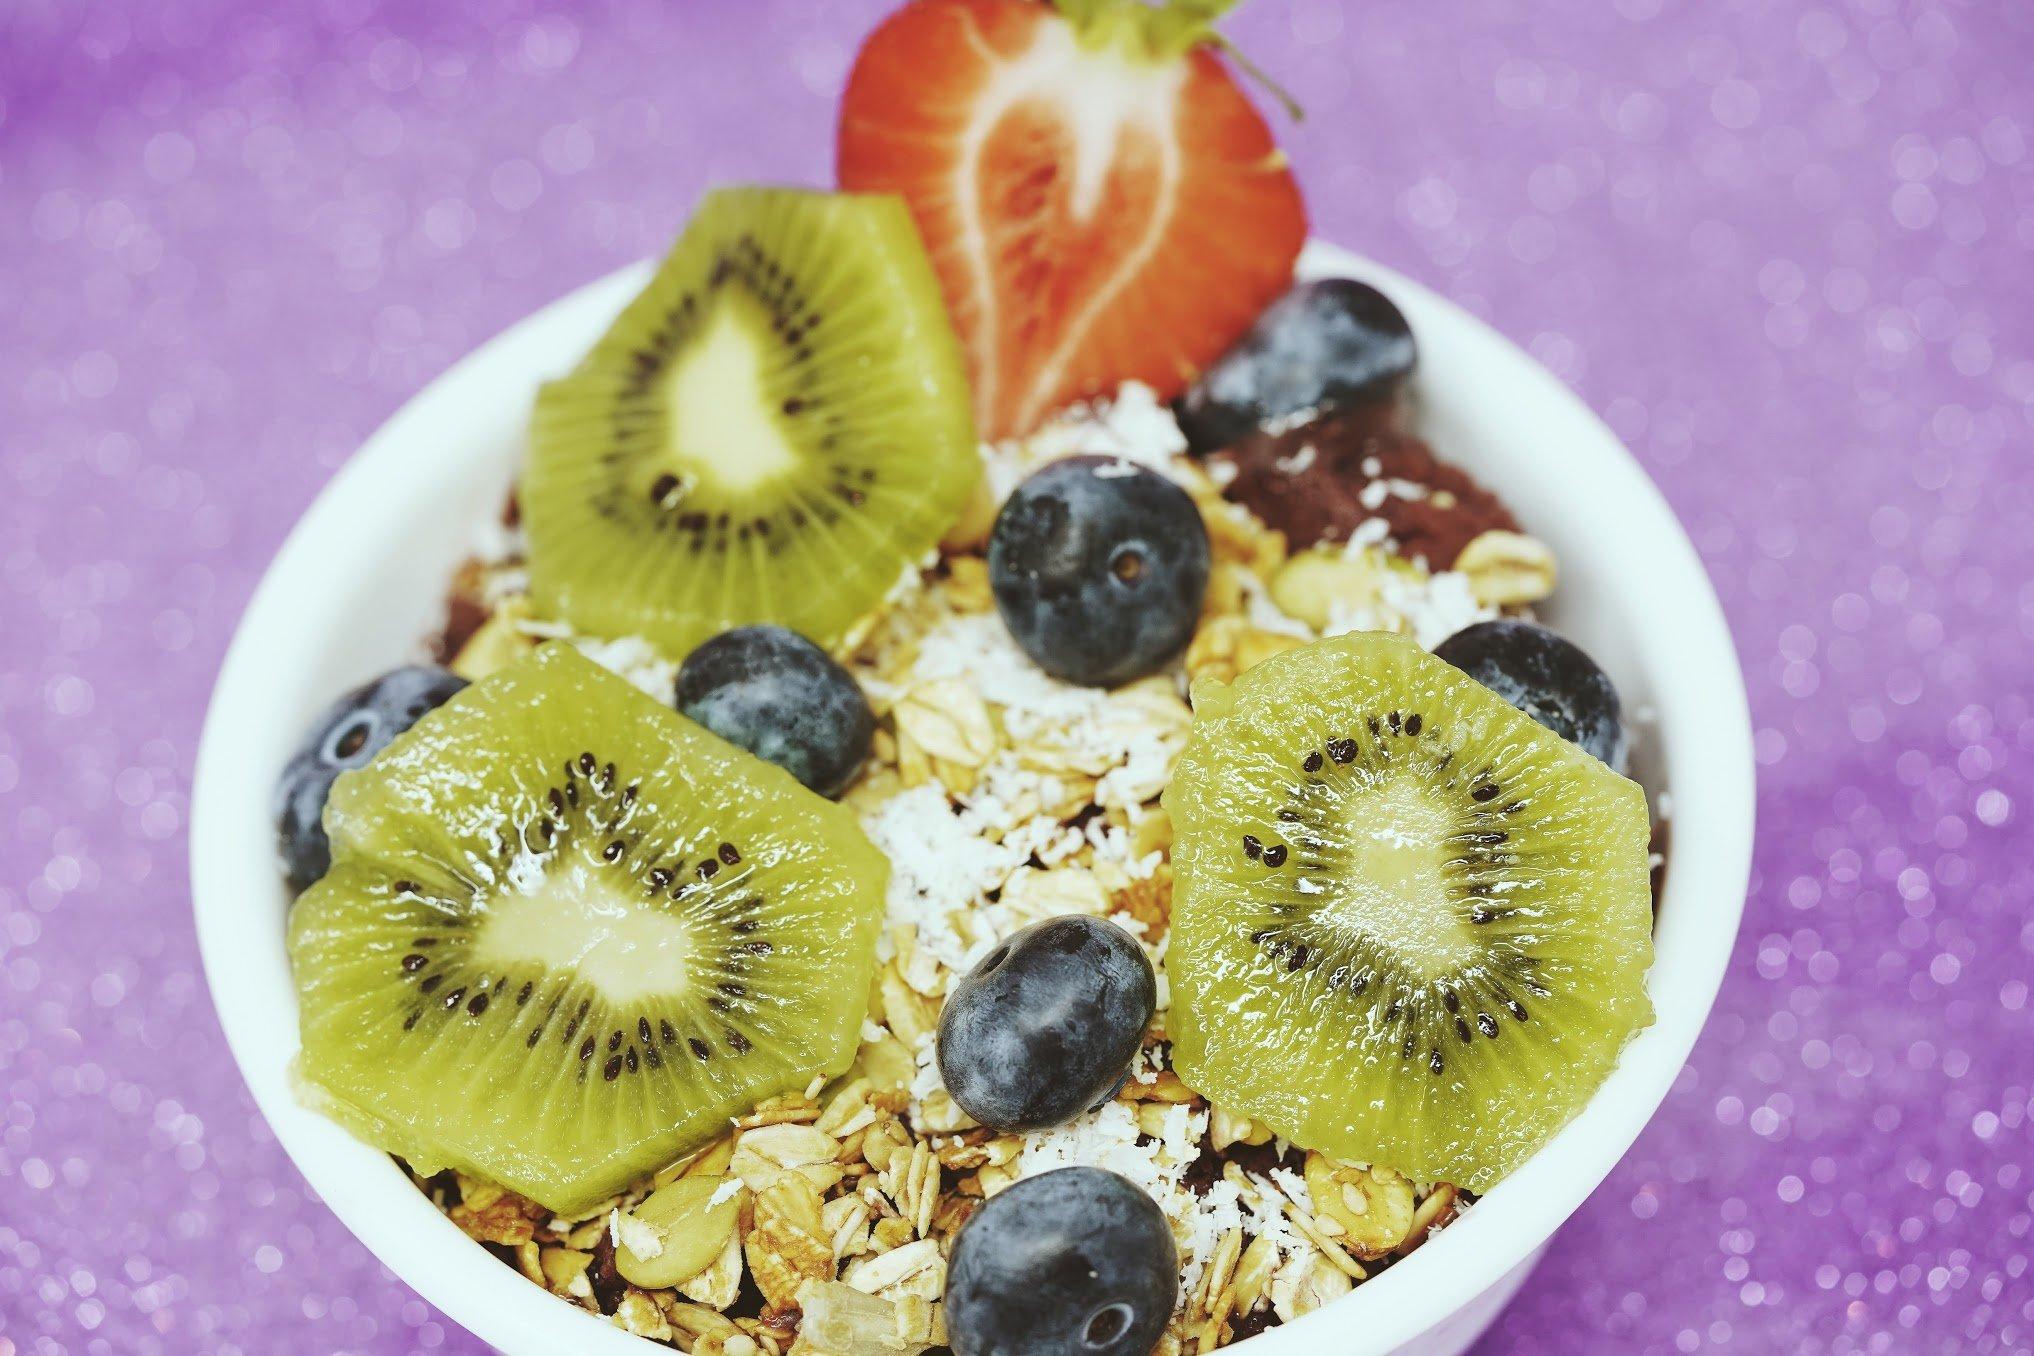 Best-Breakfast-Miami-Healthy-Breakfast-Acai-Bowl-SoBeVegan-10-6-19